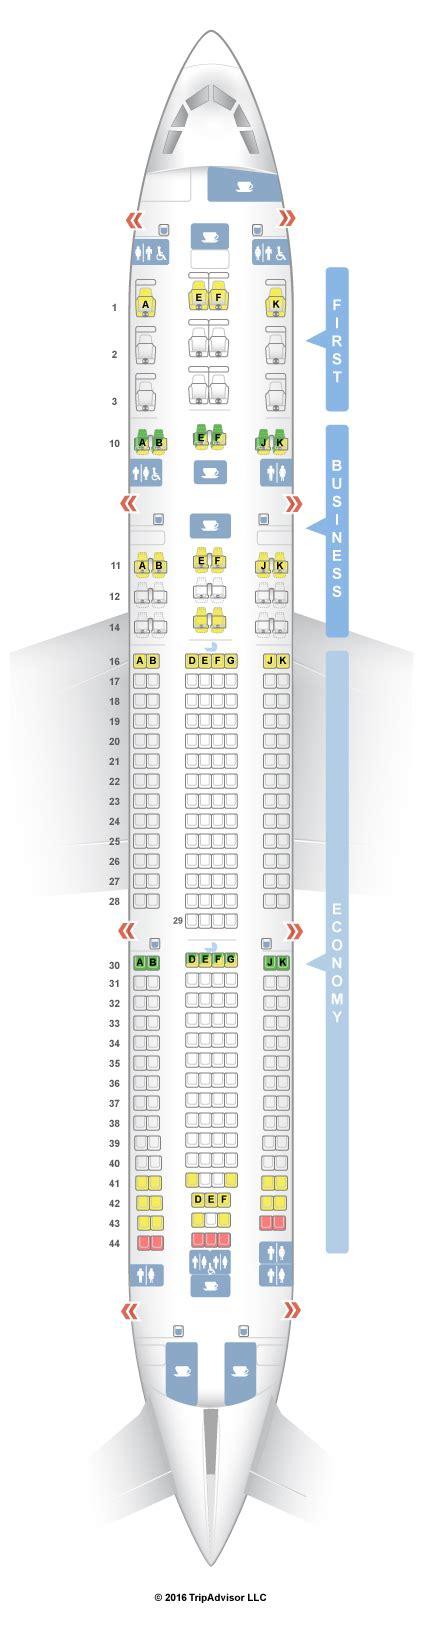 siege a320 seatguru seat map qatar airways airbus a330 300 333 v2